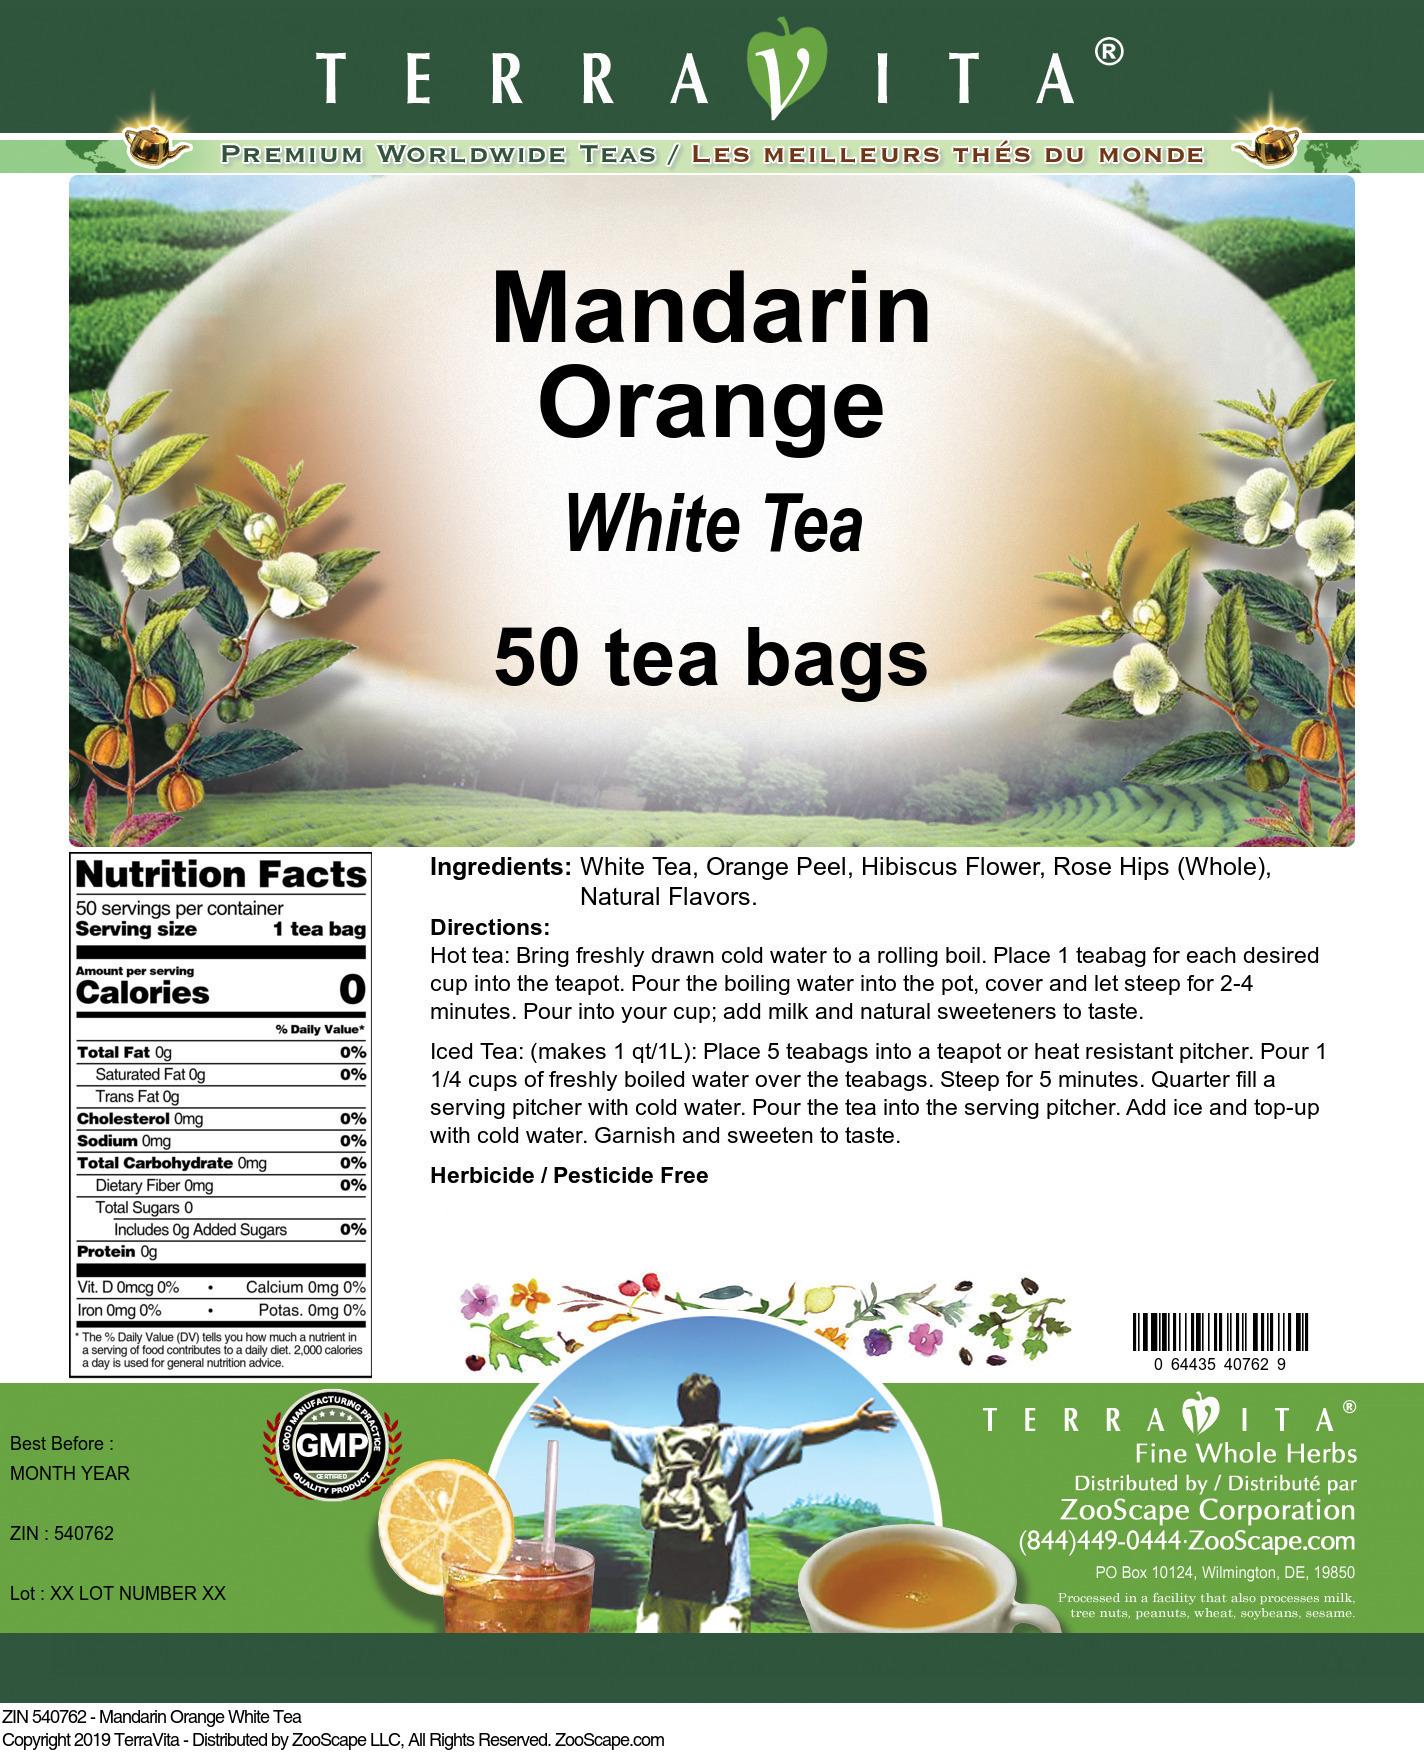 Mandarin Orange White Tea